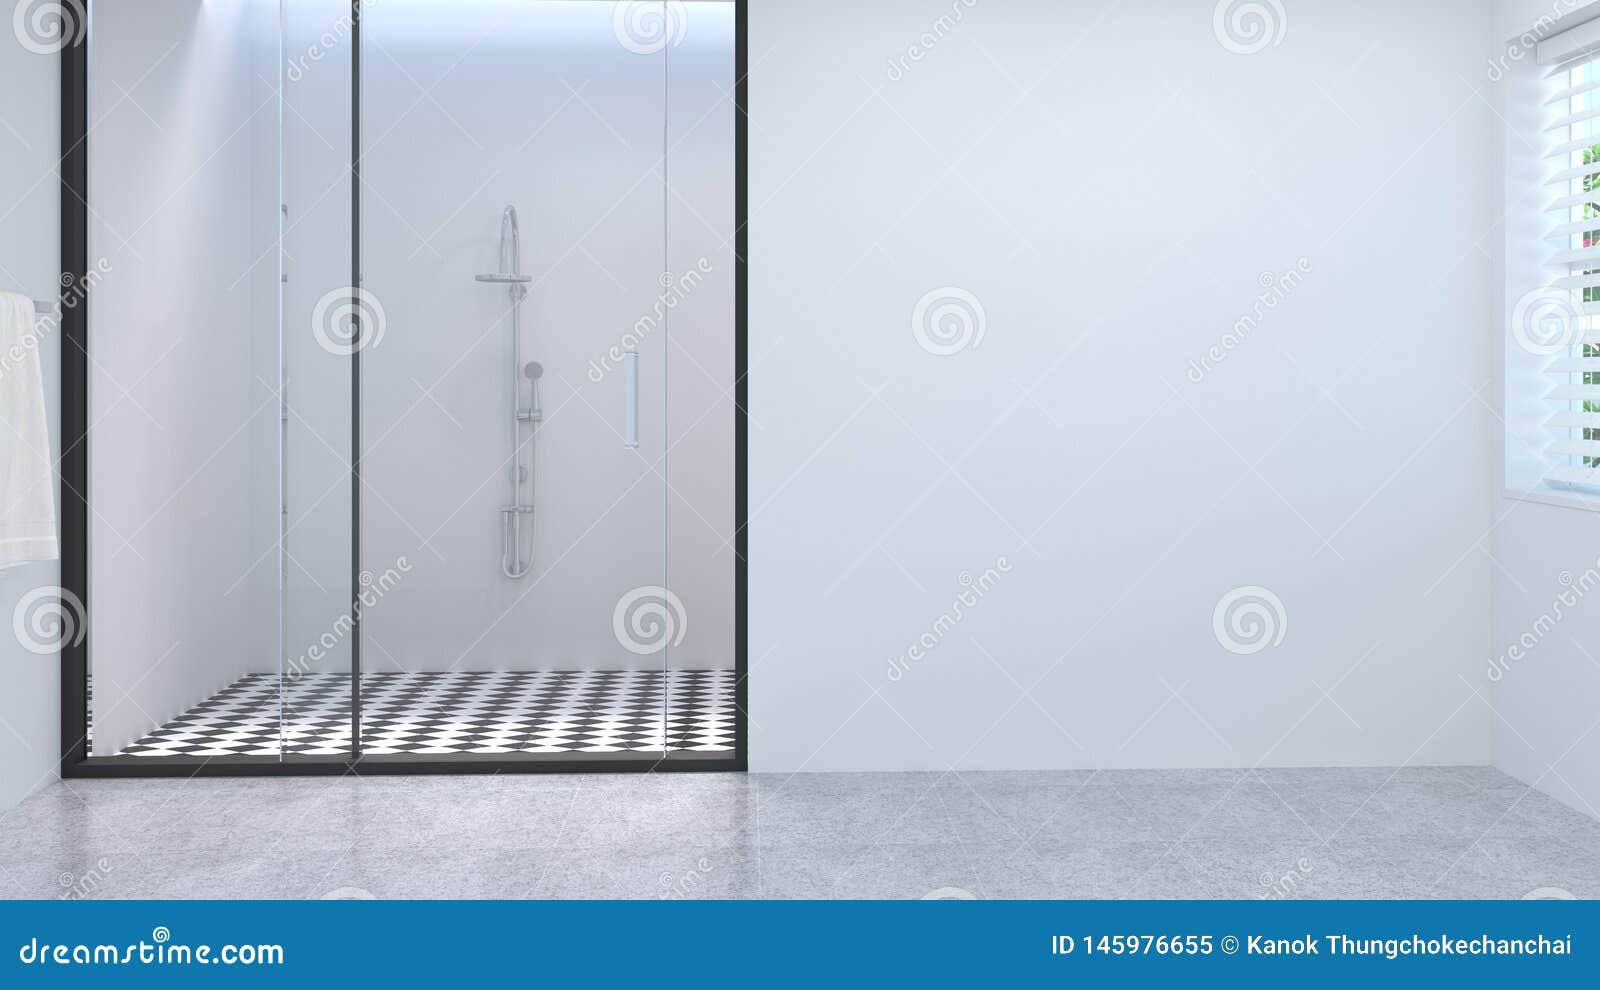 Blank space clean white empty bathroom interior,toilet,shower,modern home design background white tile bathroom 3d rendering